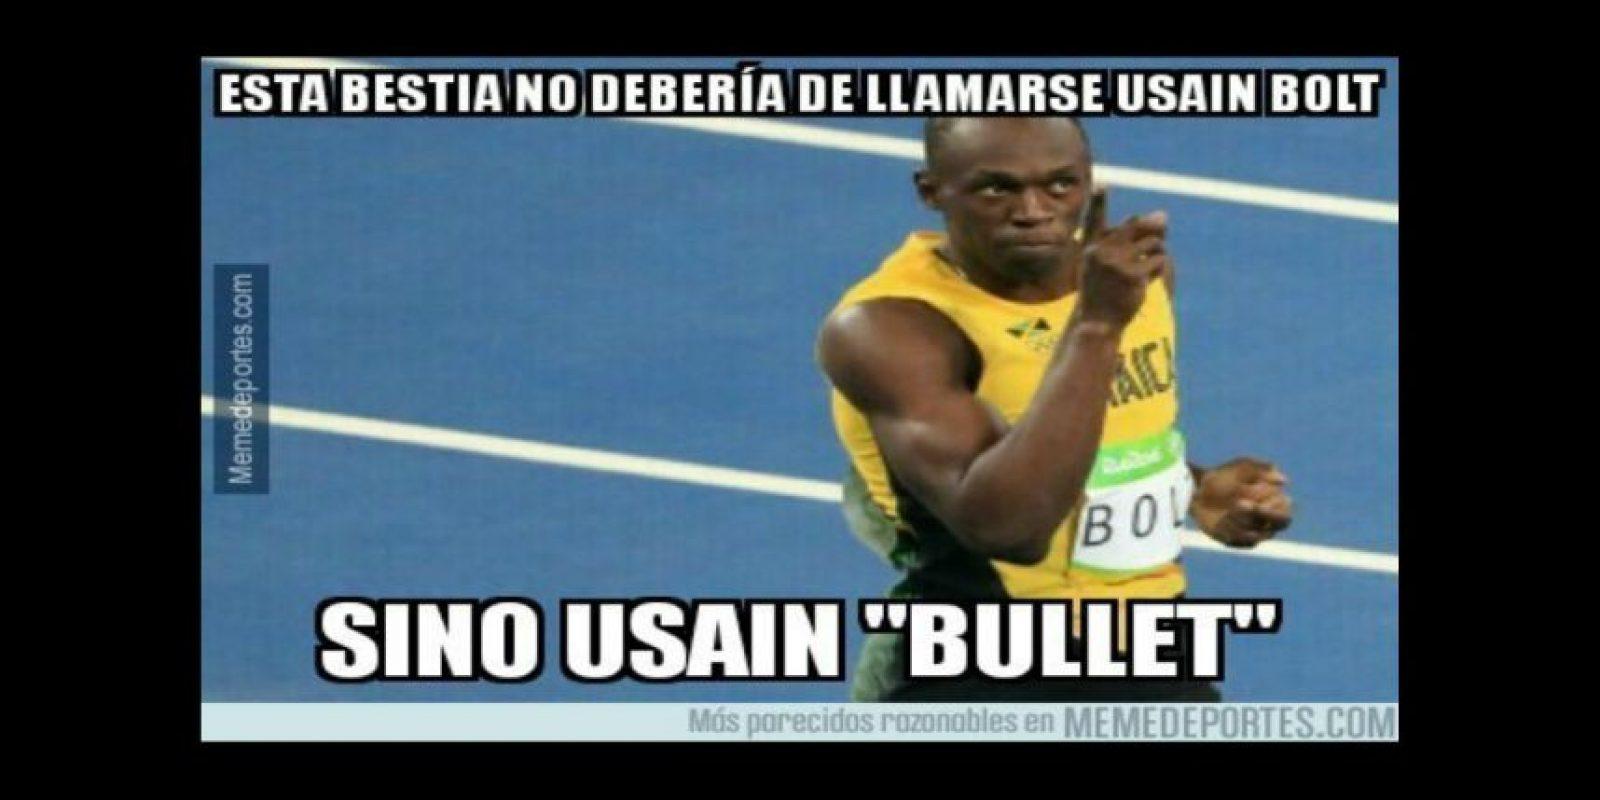 Los mejores memes del triunfo de Bolt en 200 metros Foto:Twitter. Imagen Por: